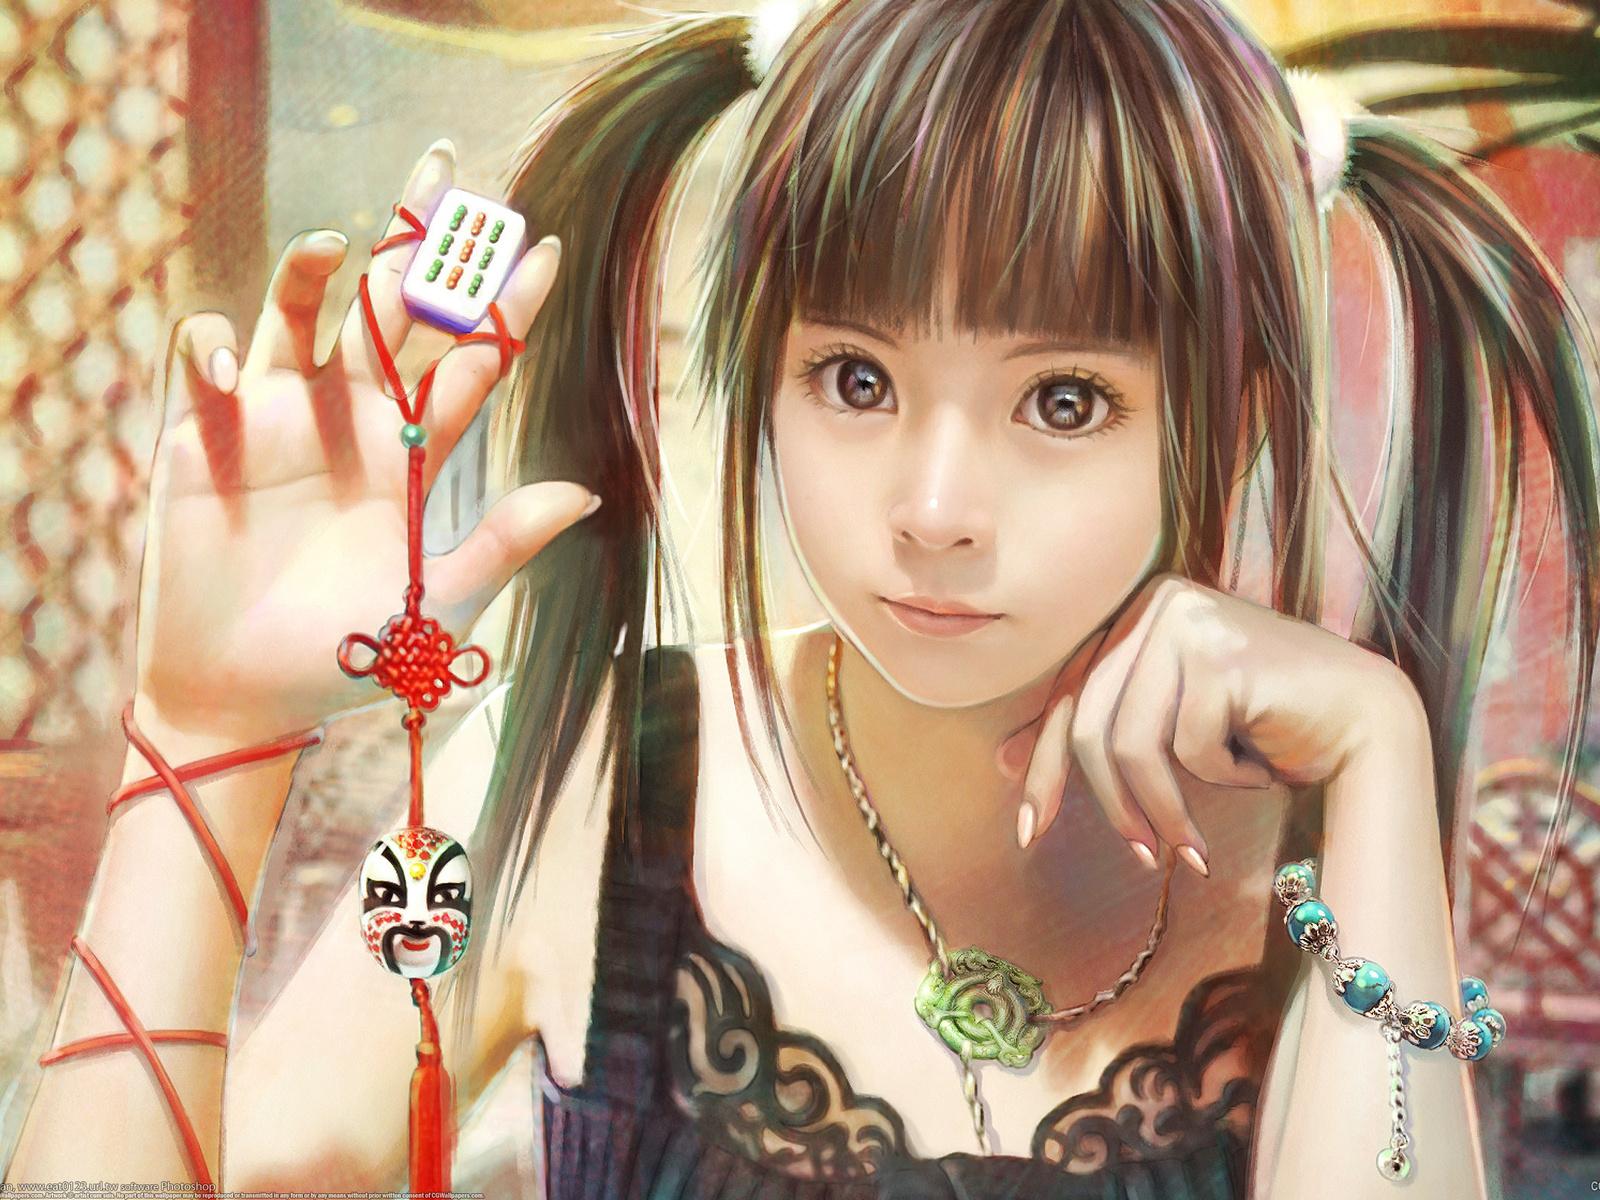 Anime 3d girl